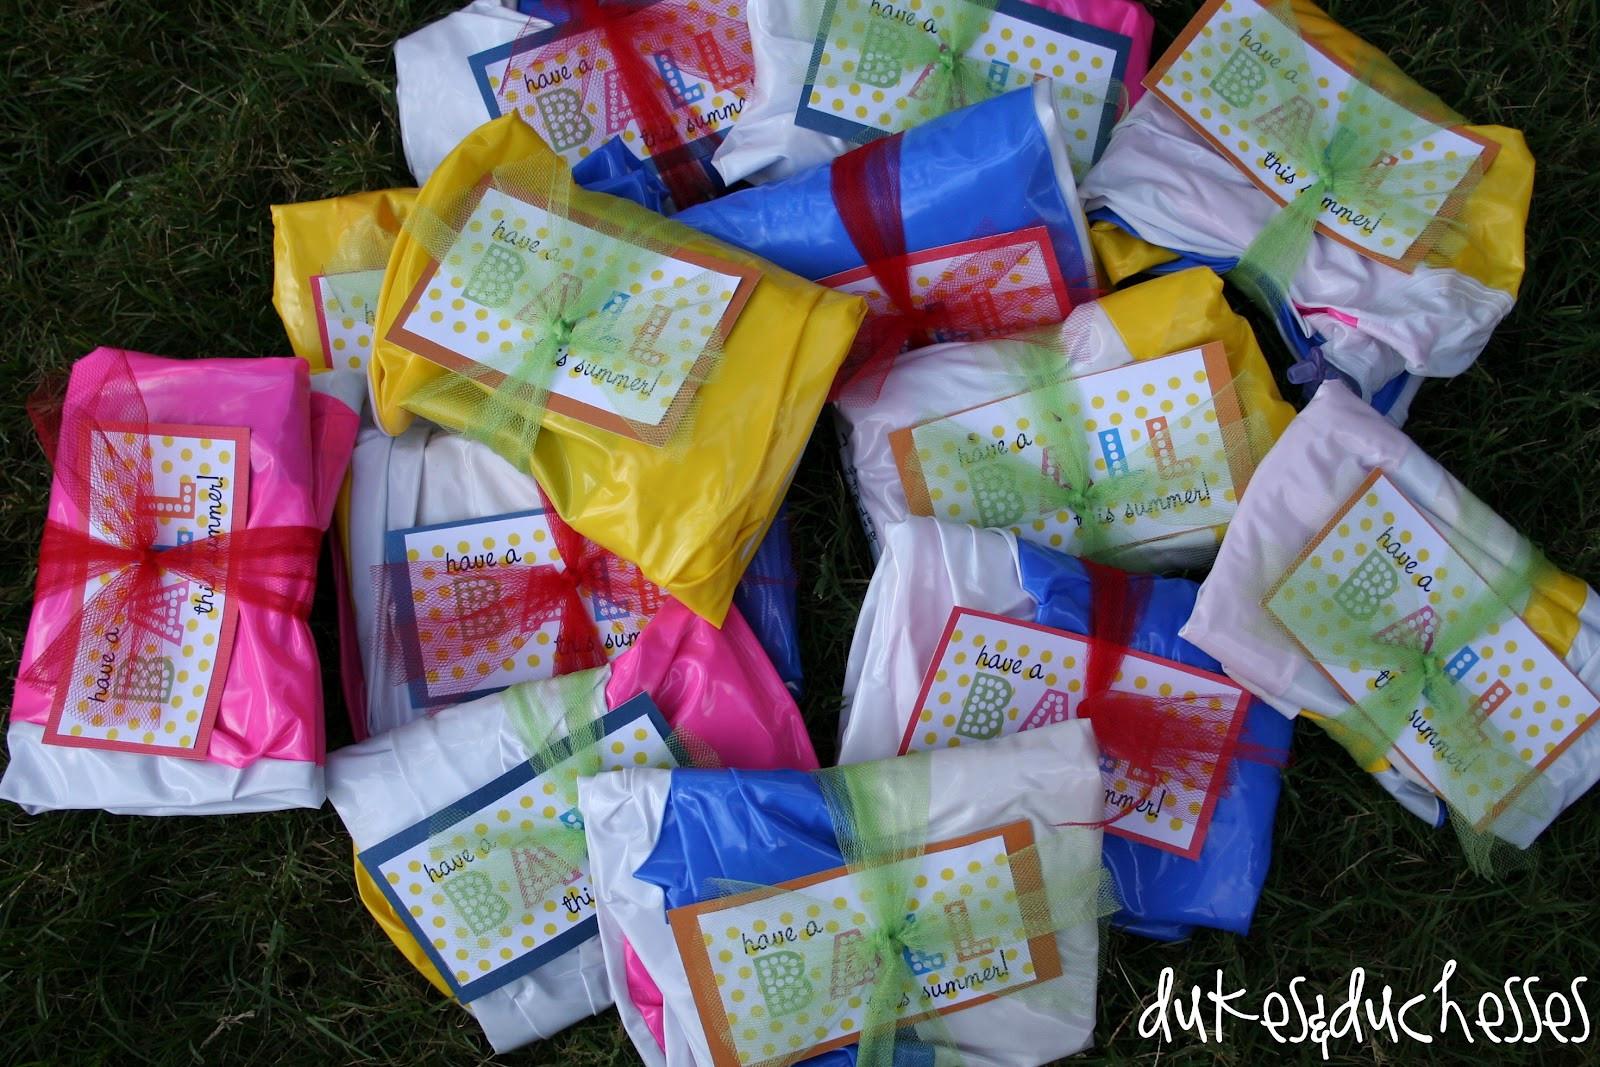 Preschool Graduation Gift Ideas From Teacher  End of Year Kindergarten DIY Graduation Gift Ideas for